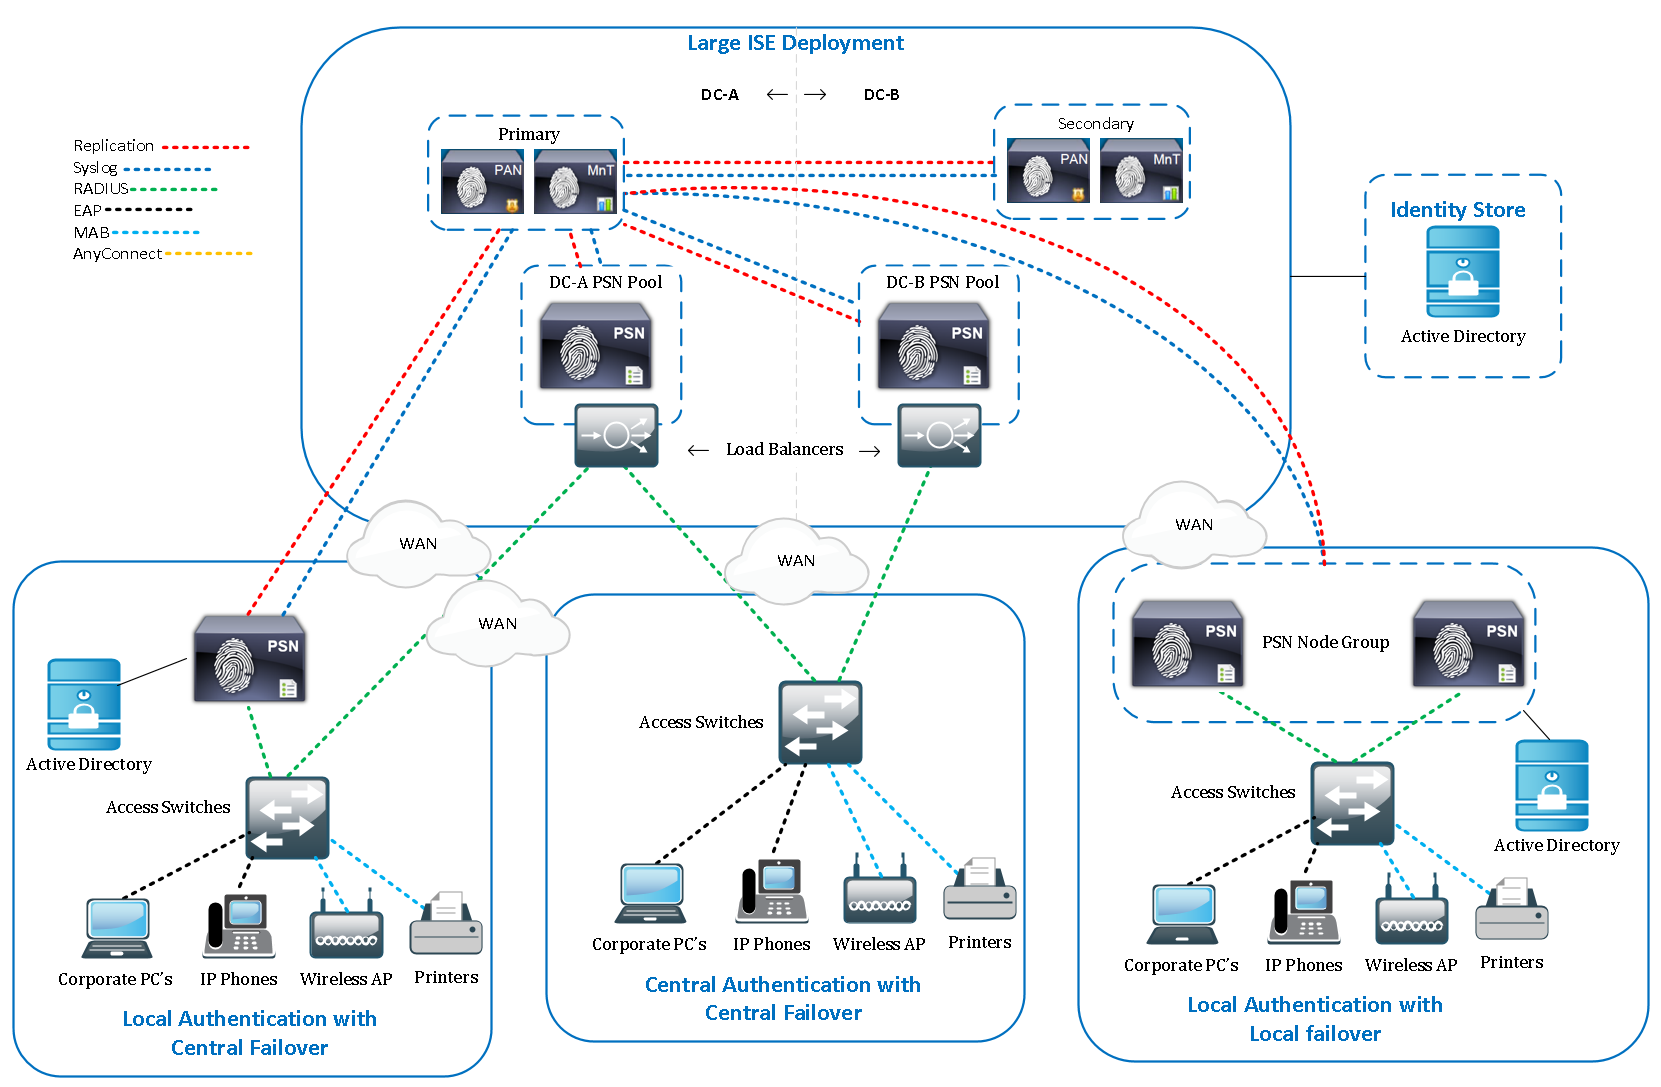 Cisco ISE Large Deployment